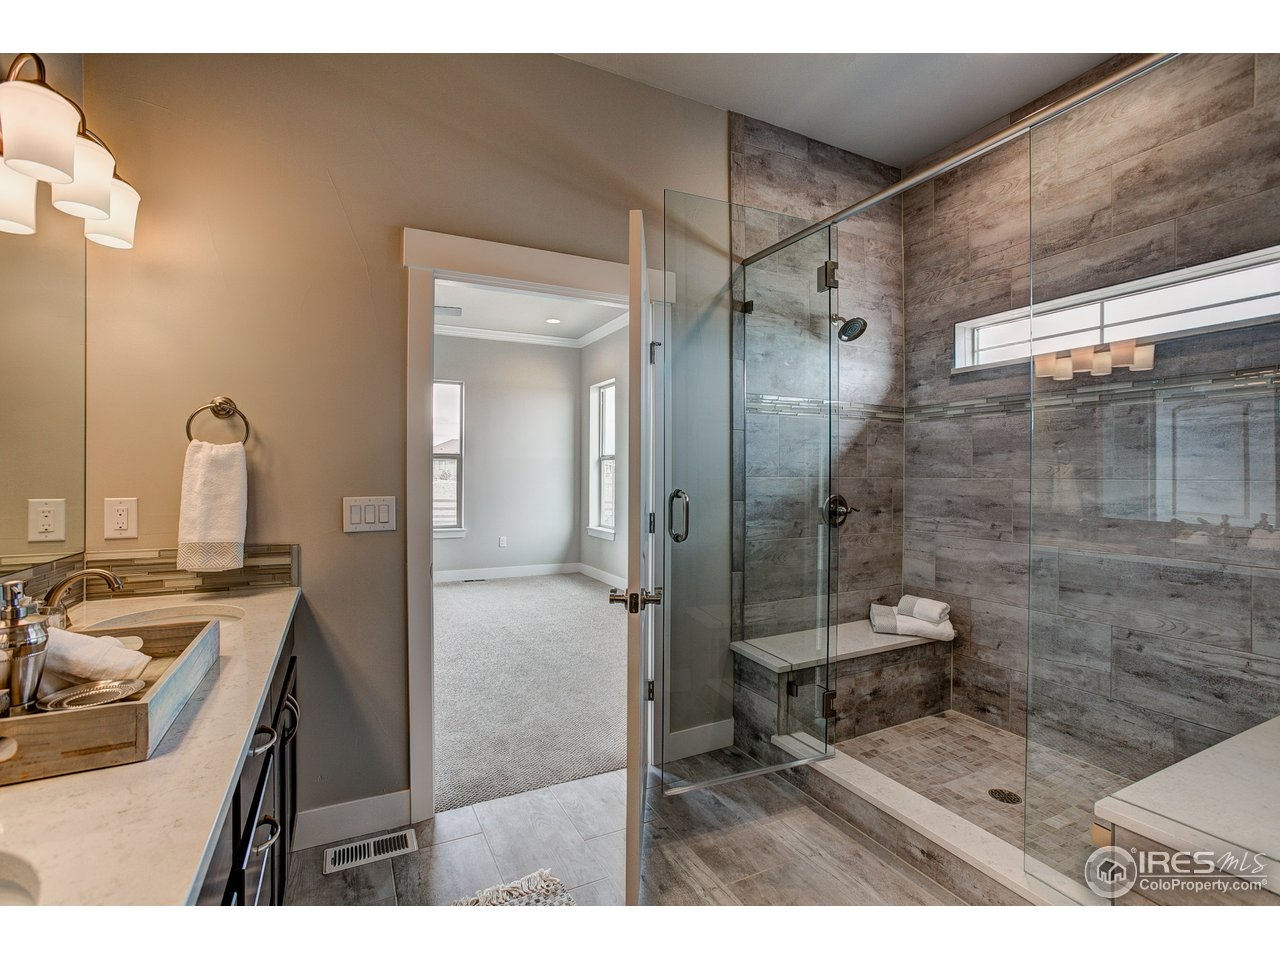 oversized double head shower